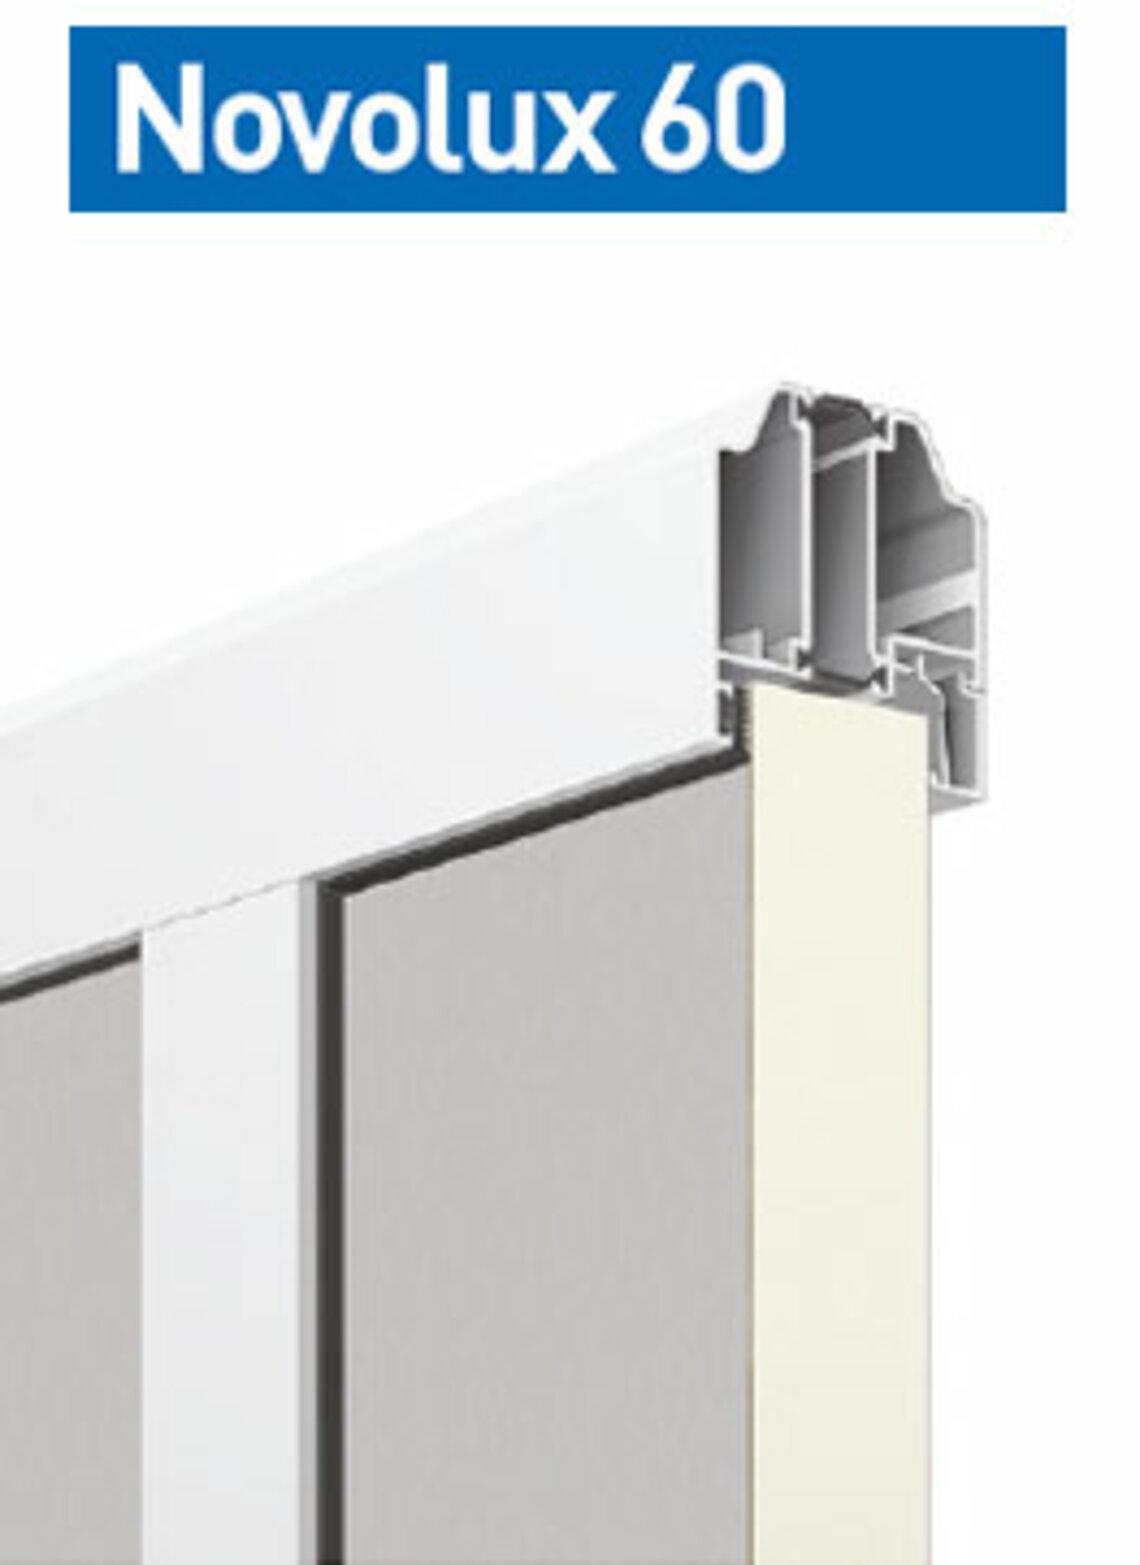 Novolux 60 40 mm: płaska blacha